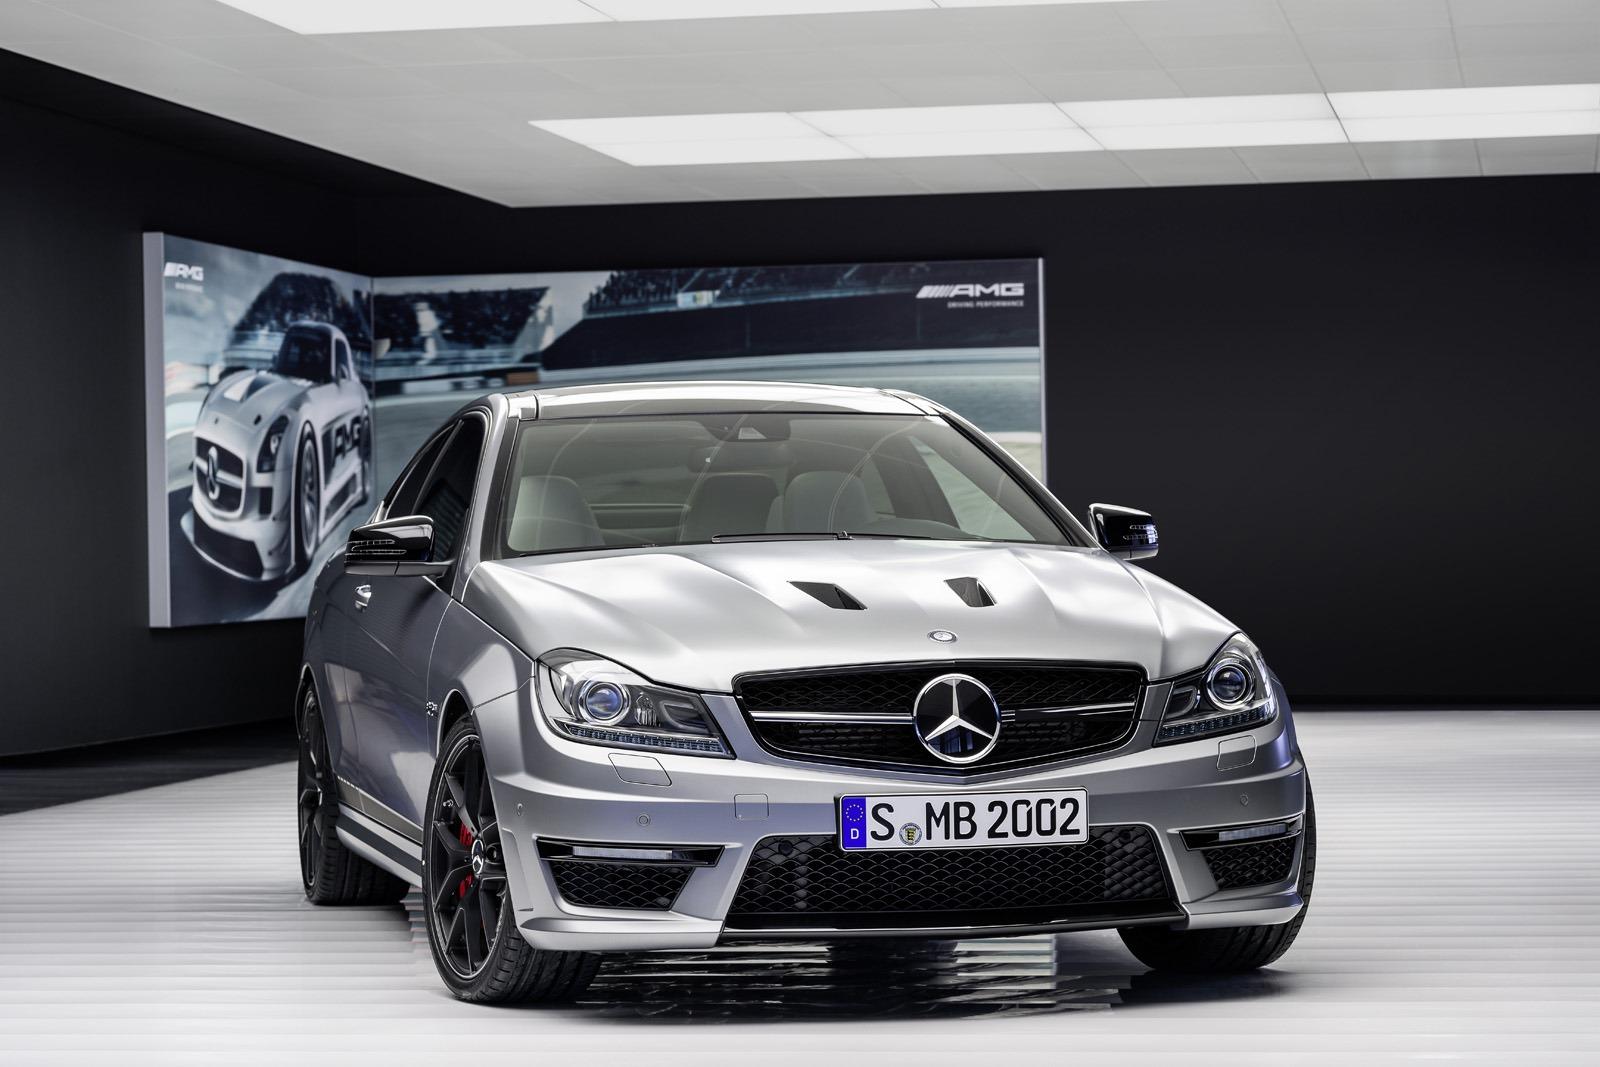 Mercedes-C63-AMG-Edition-507-3%25255B3%25255D.jpg